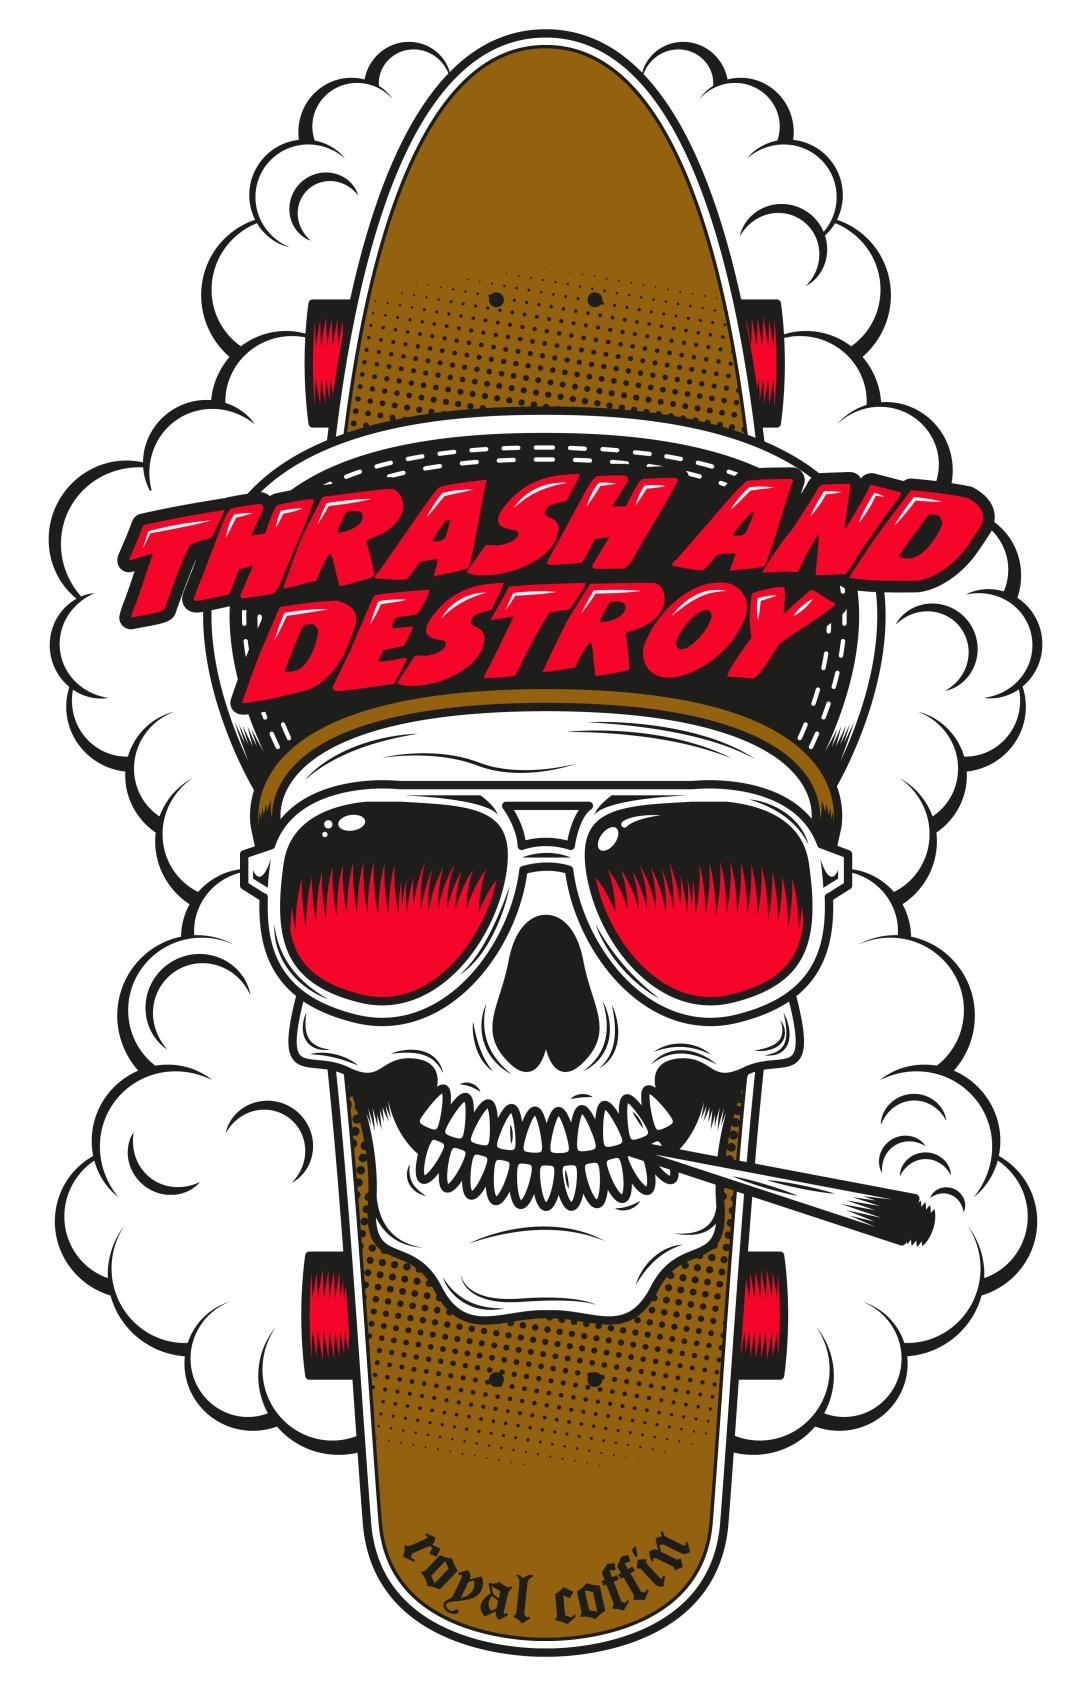 thrashdestroyklar